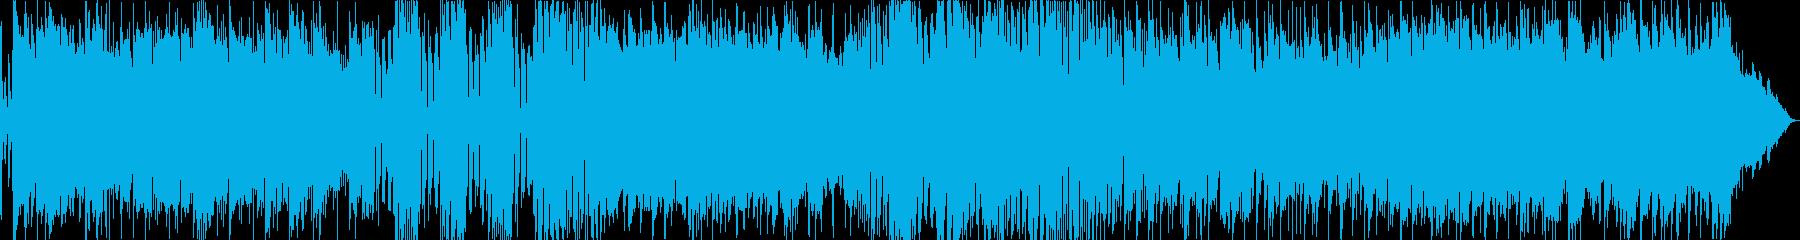 SUITE 3連と4連のリズムがチェーンの再生済みの波形